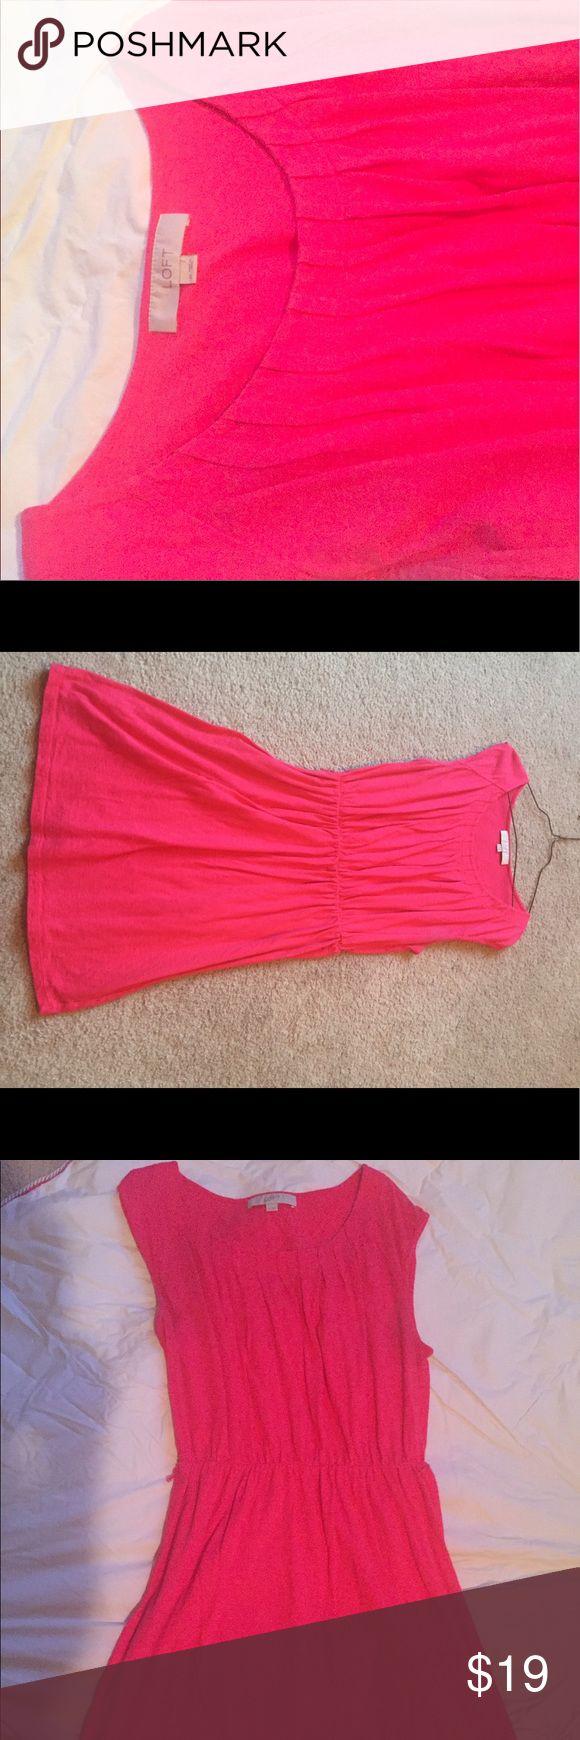 LOFT, PINK DRESS LOFT, PINK DRESS, wear for office work or weekend outing in HOT SUMMER DAY! LOFT Dresses Midi